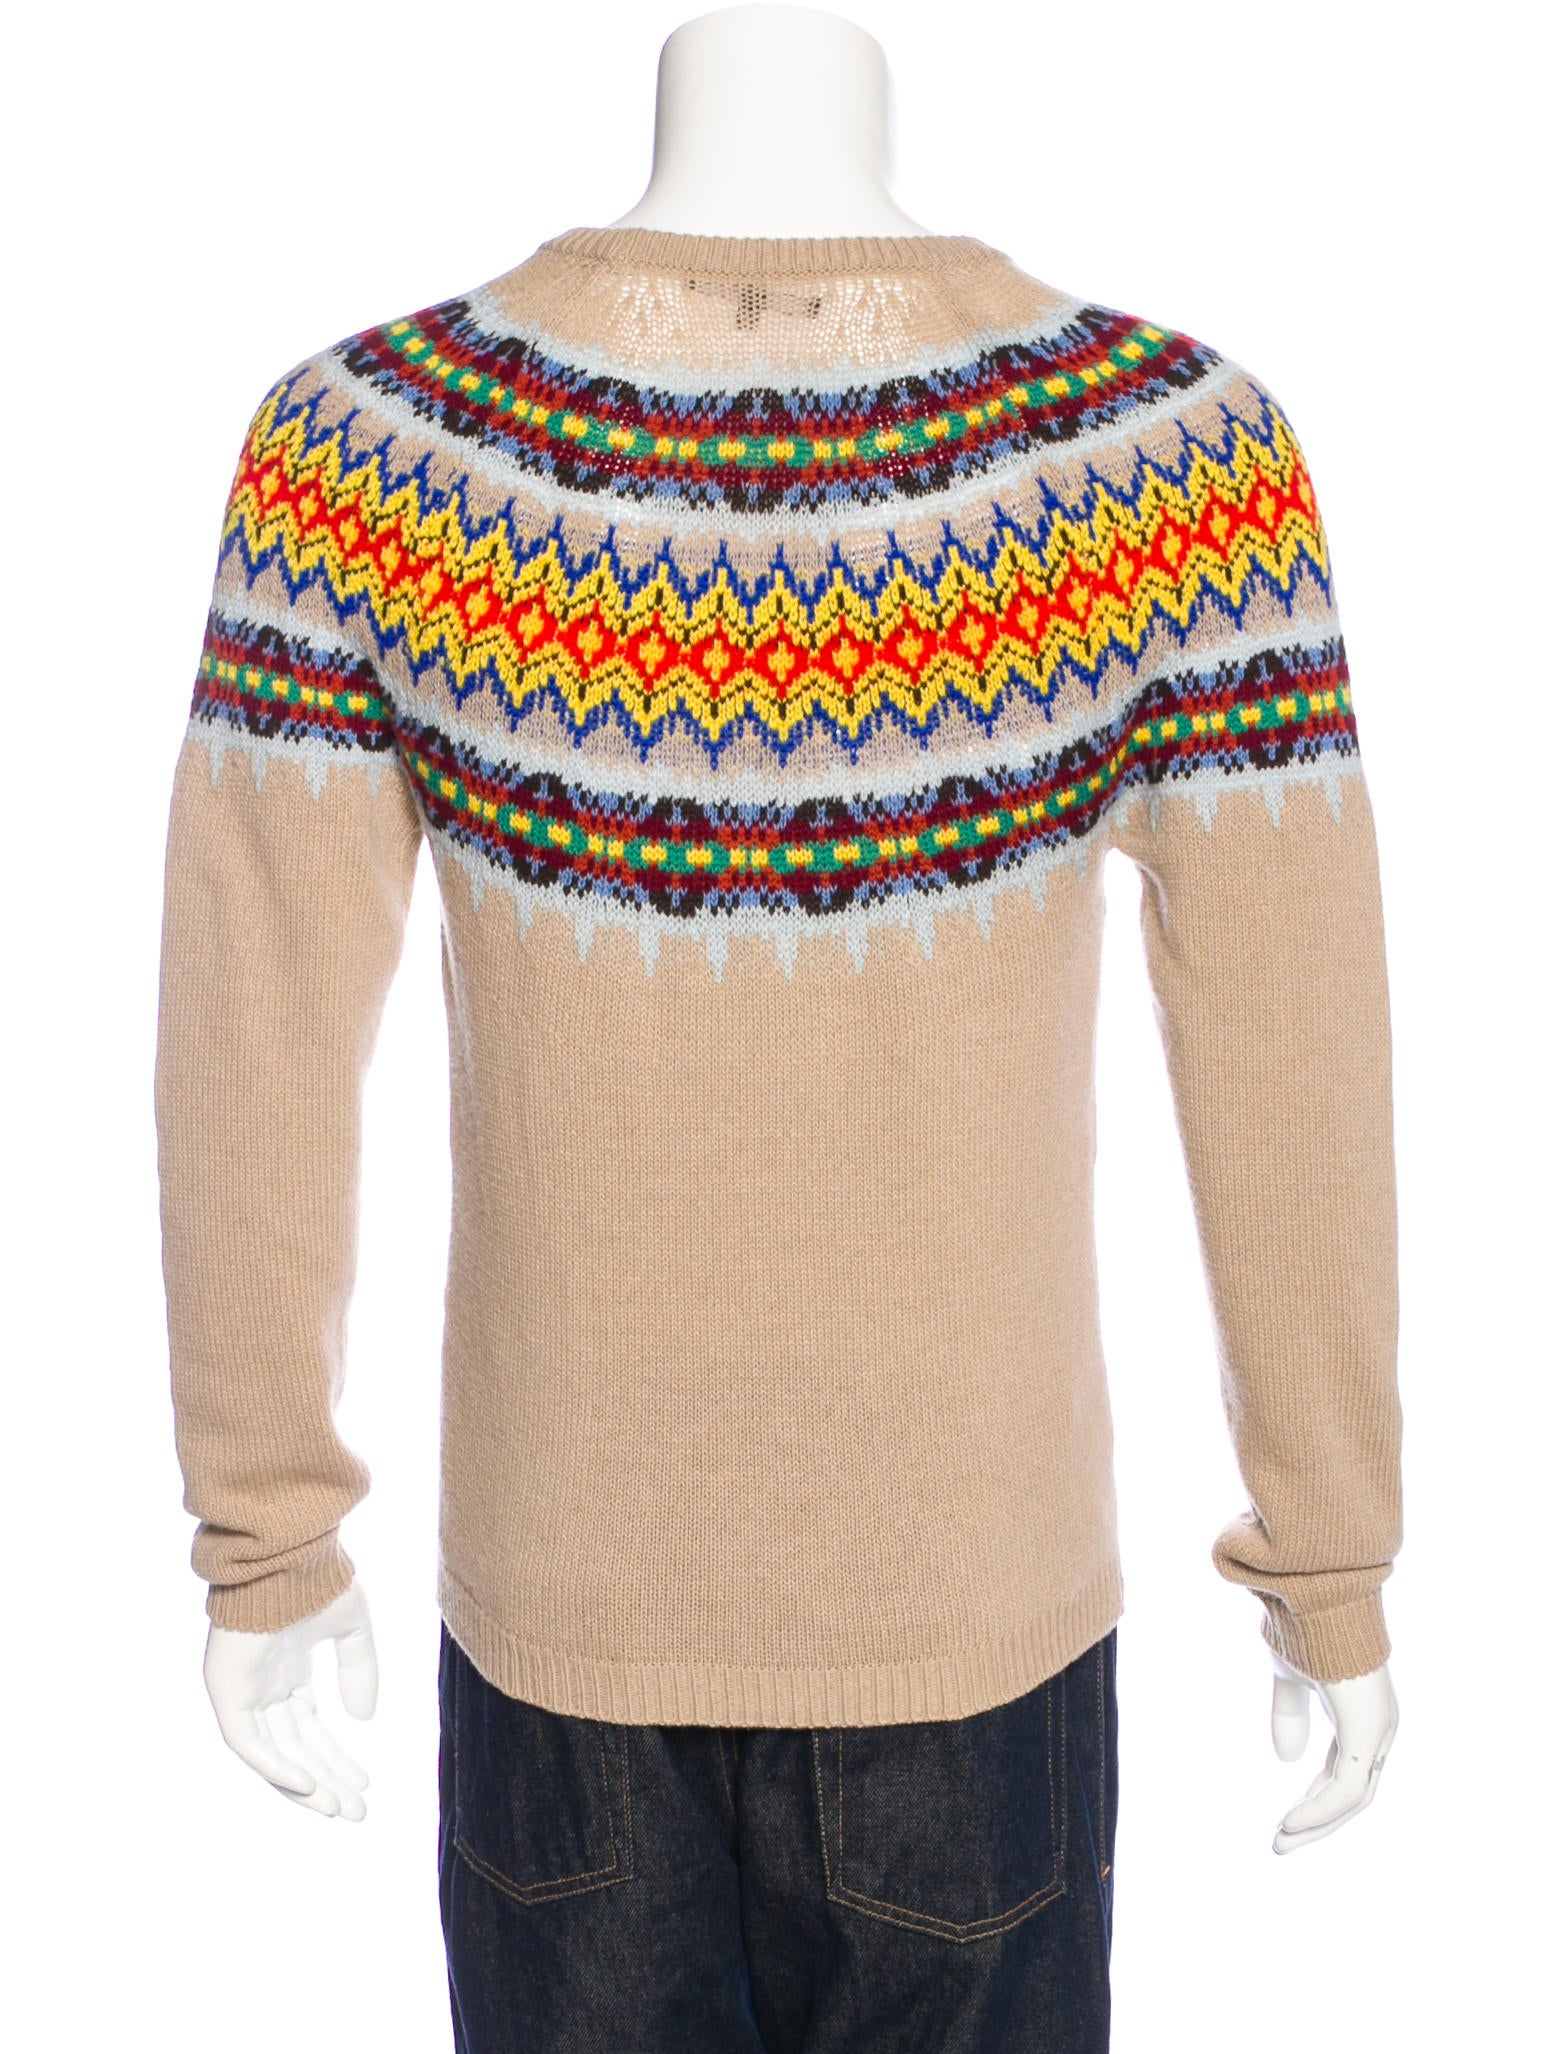 Wool Sweater Grey: Gucci Fair Isle Wool Sweater - Clothing - GUC157648